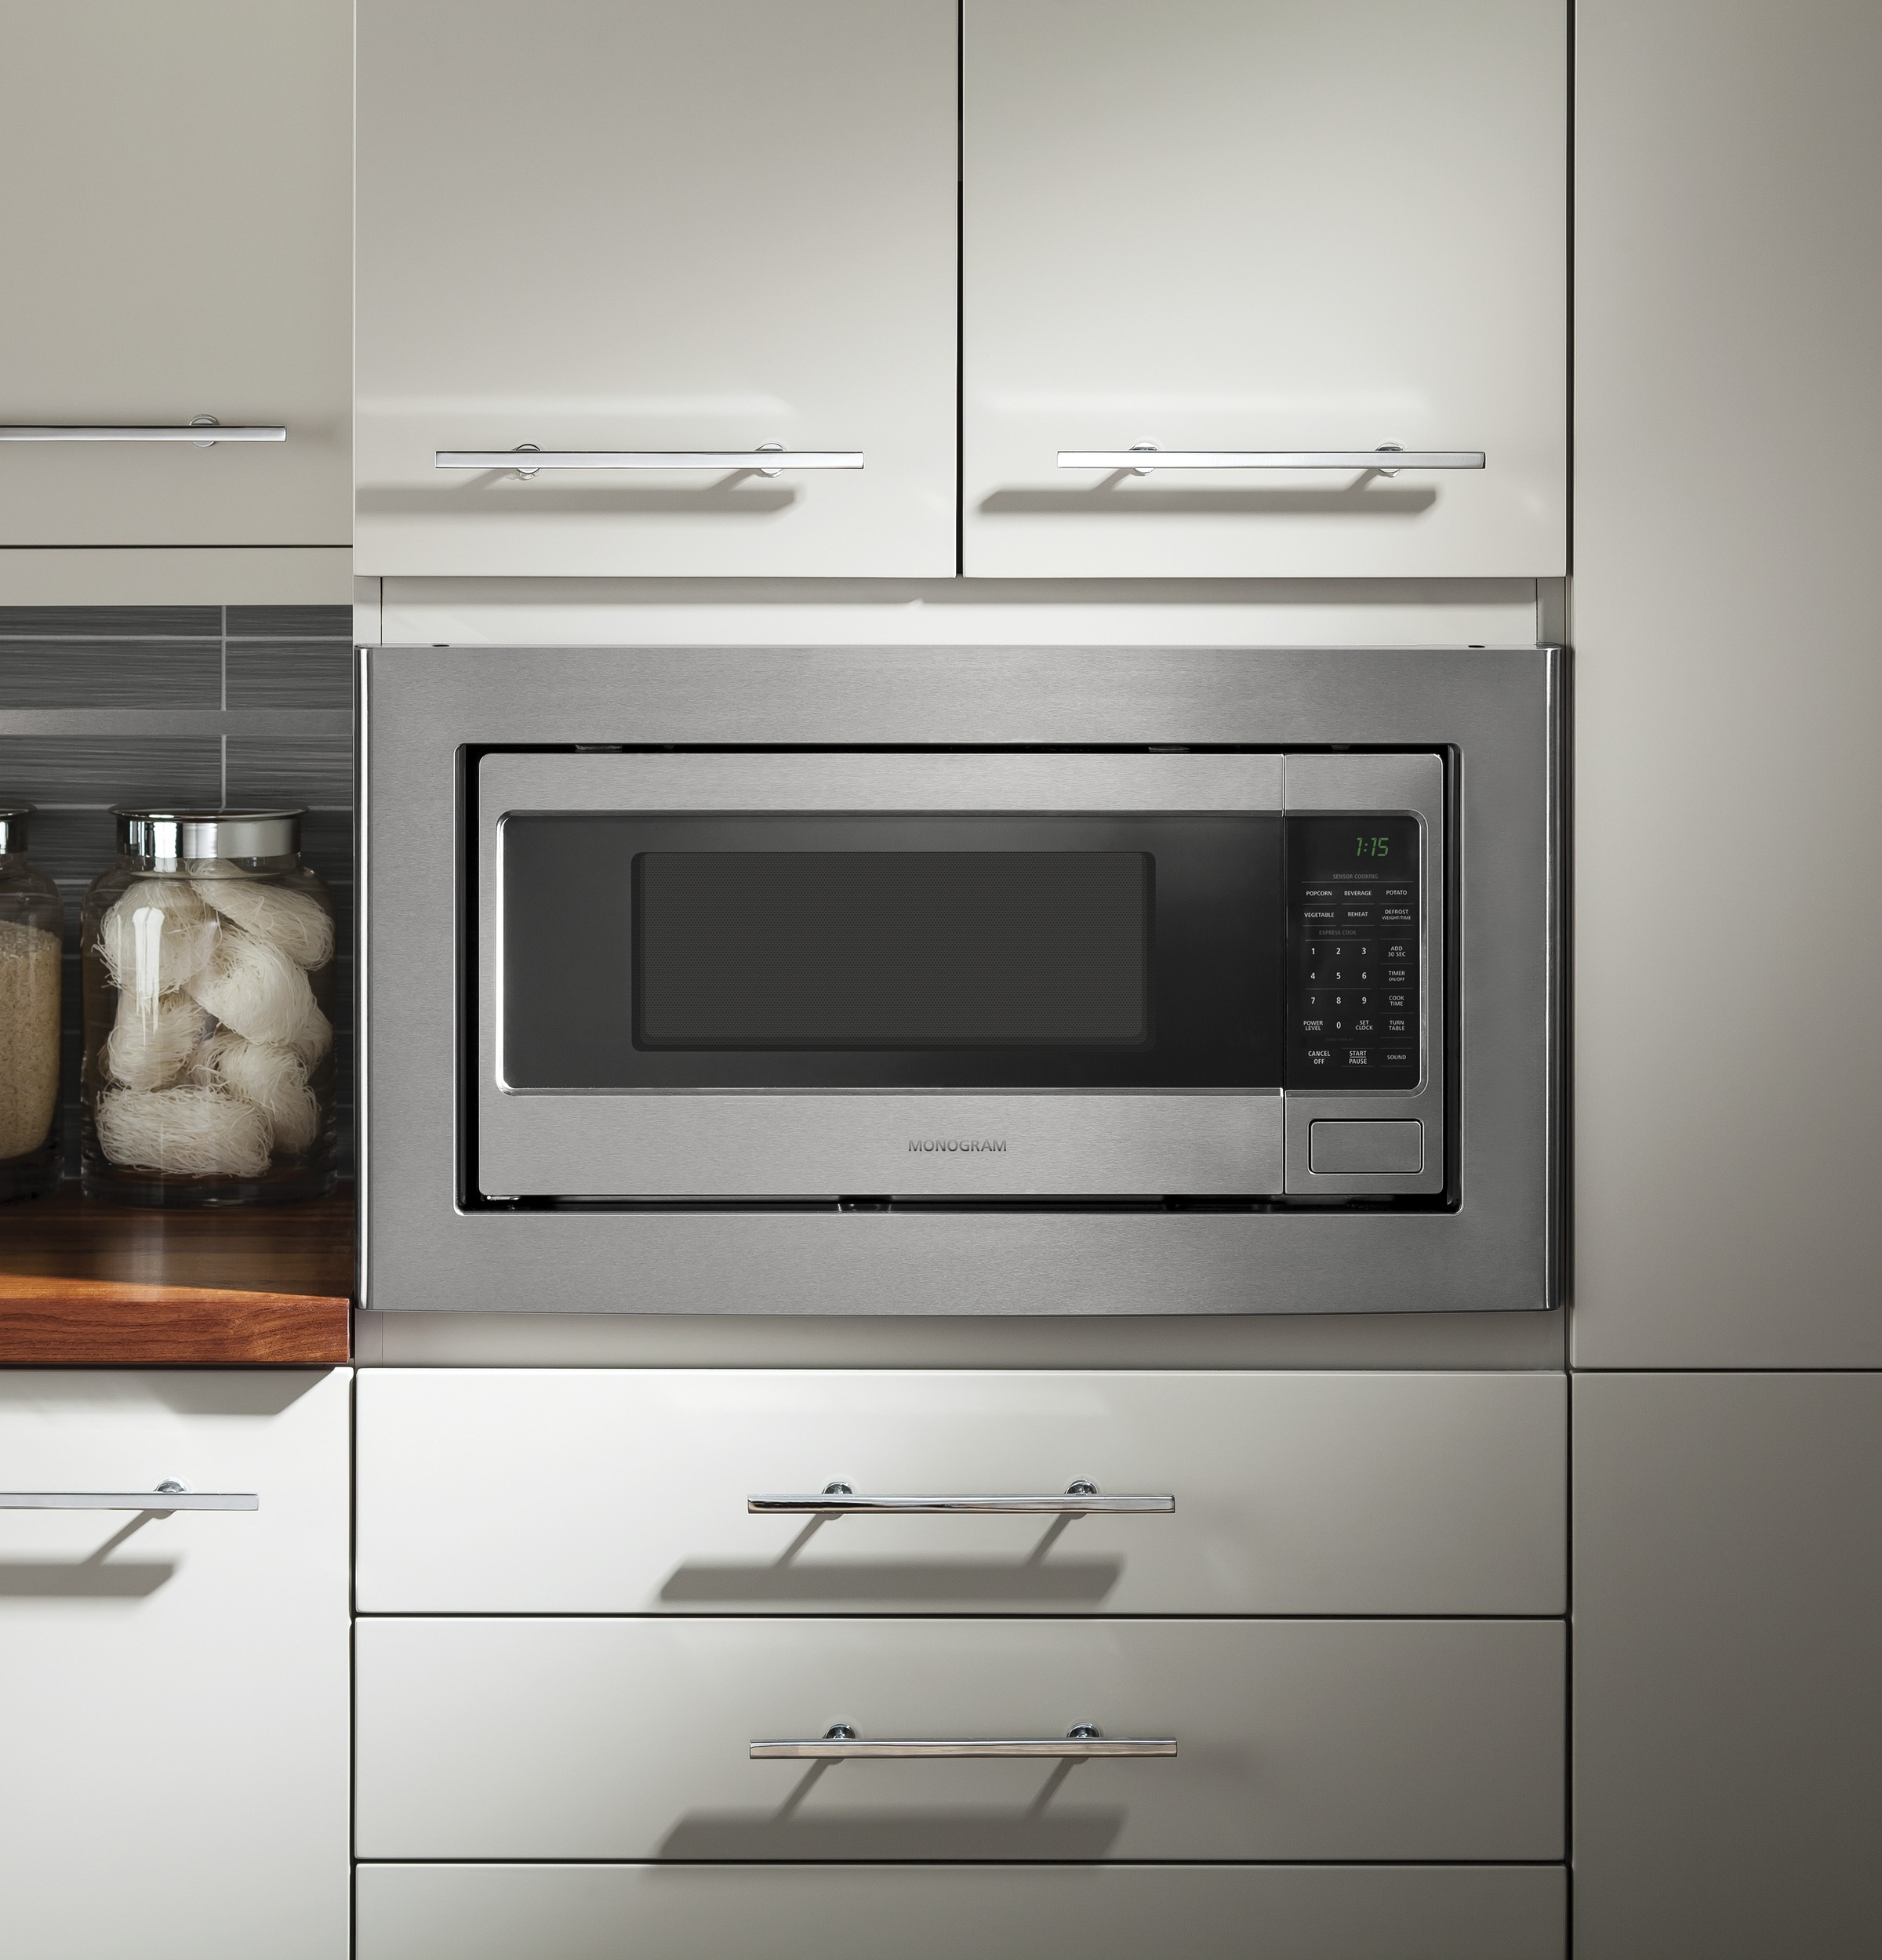 Monogram Microwaves